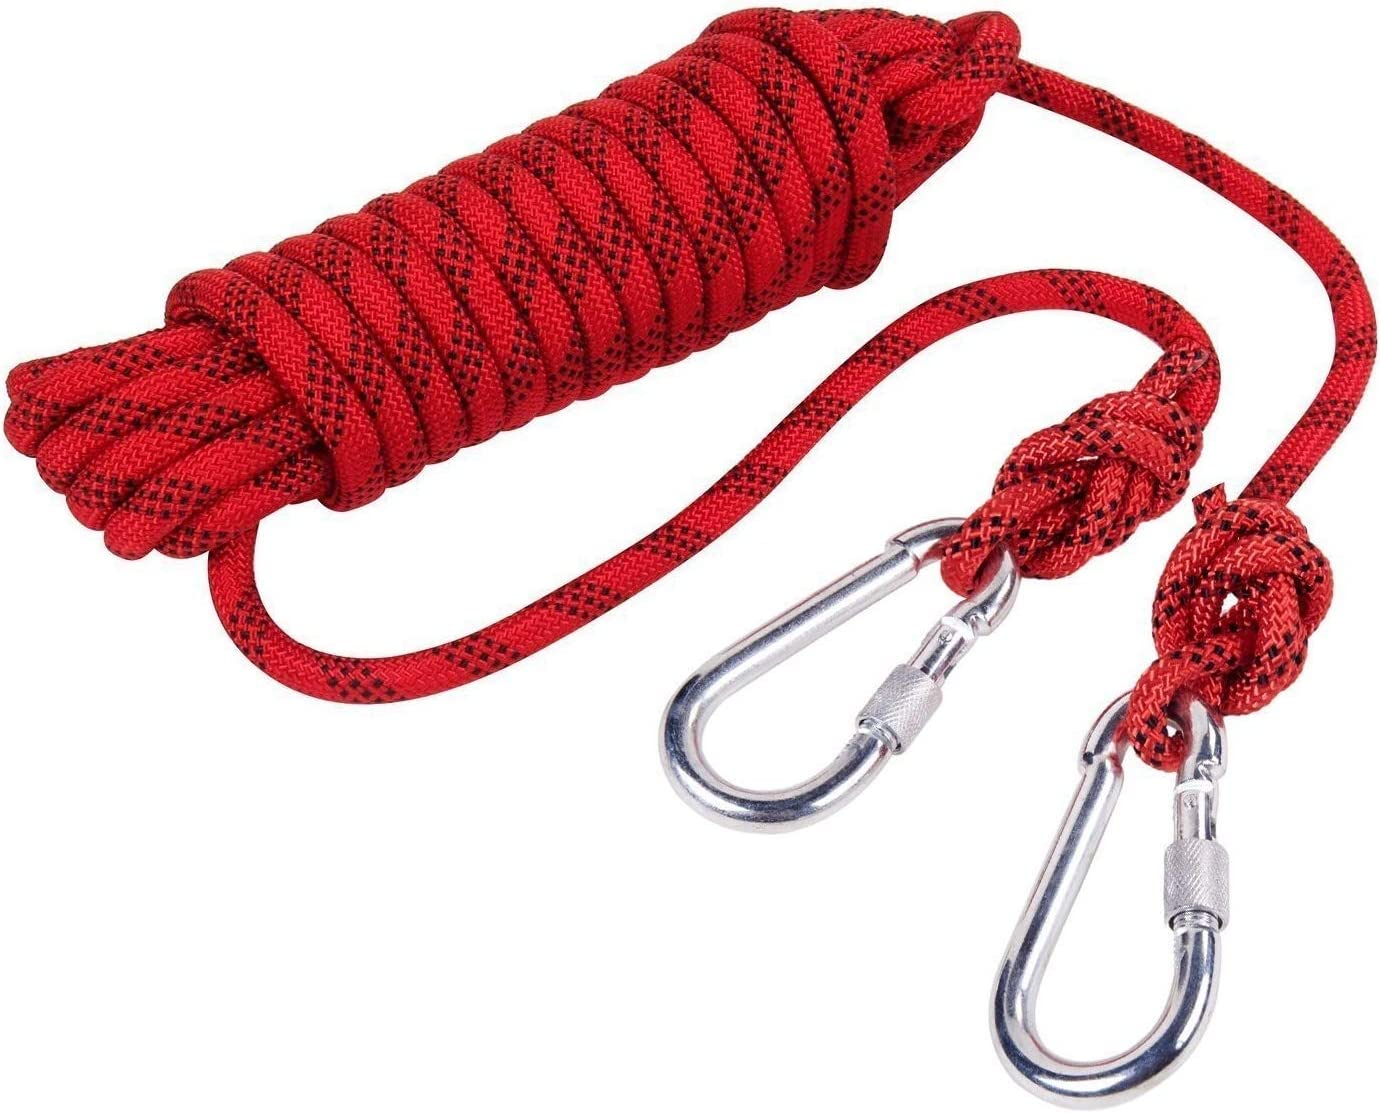 Cuerda de alpinismo 10 mm de carga 1800 kg 10M / 20M / 30M ...